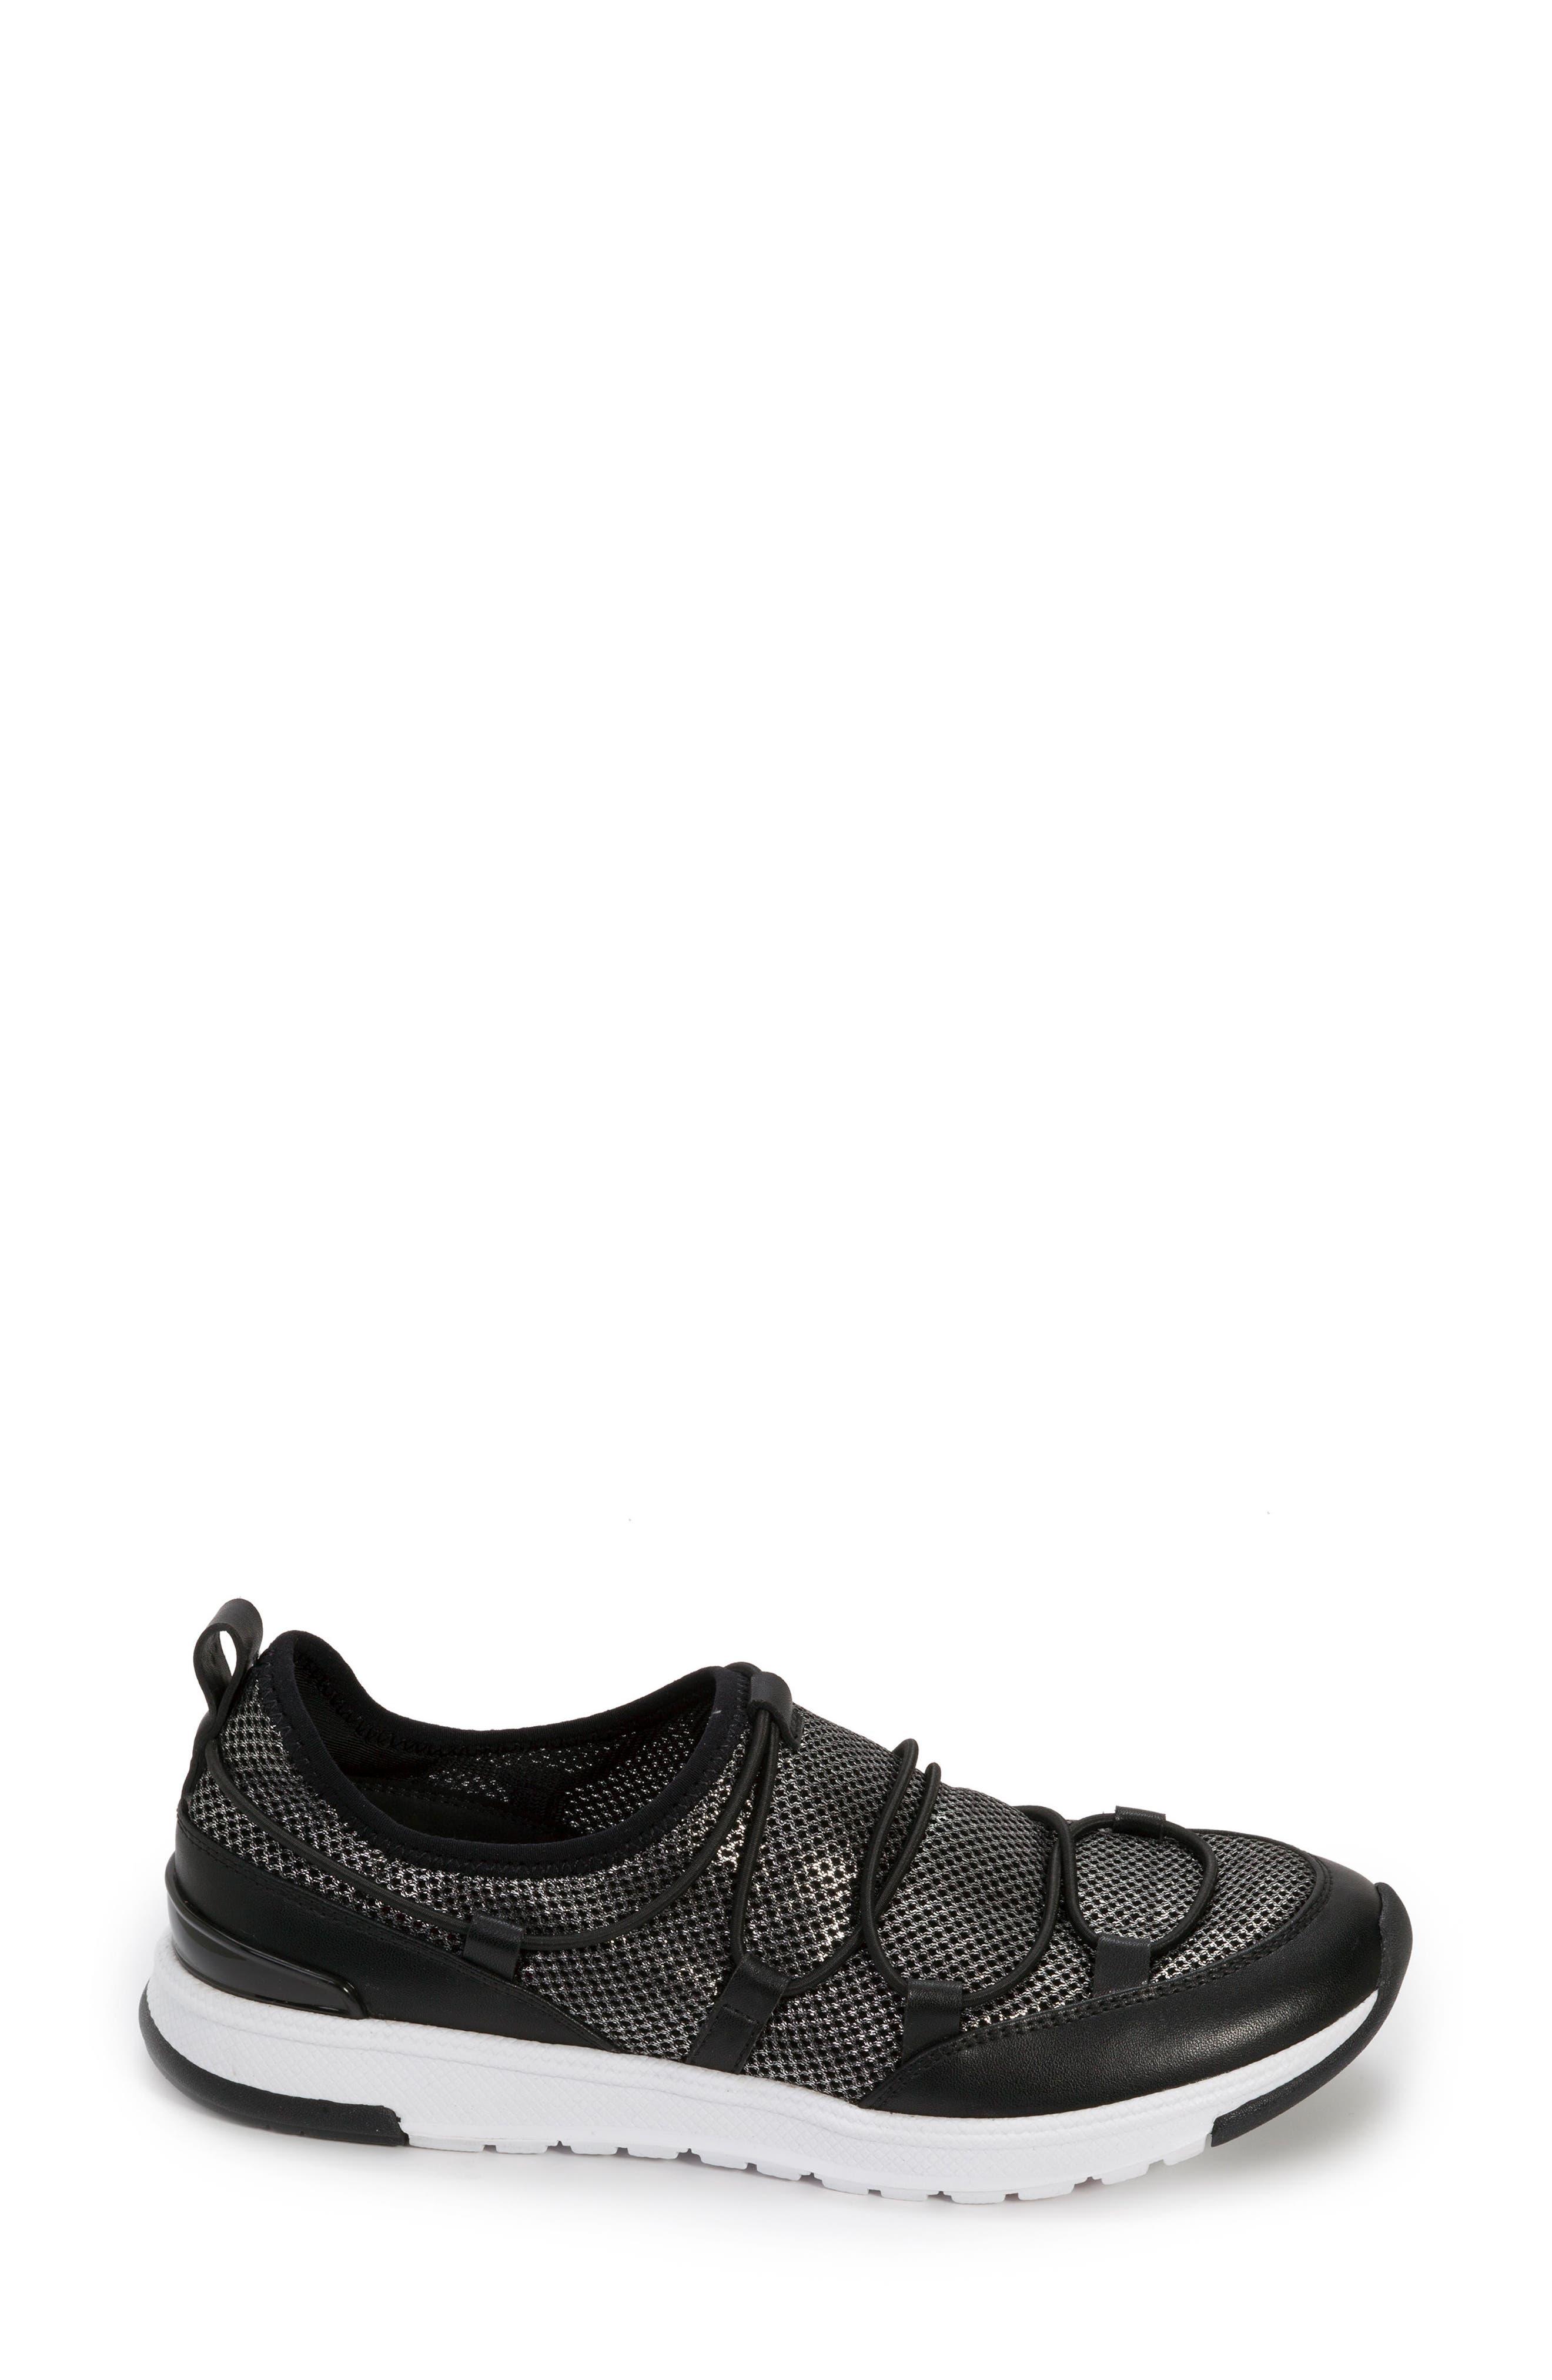 FOOT PETALS, Bree Sneaker, Alternate thumbnail 3, color, BLACK/ PEWTER